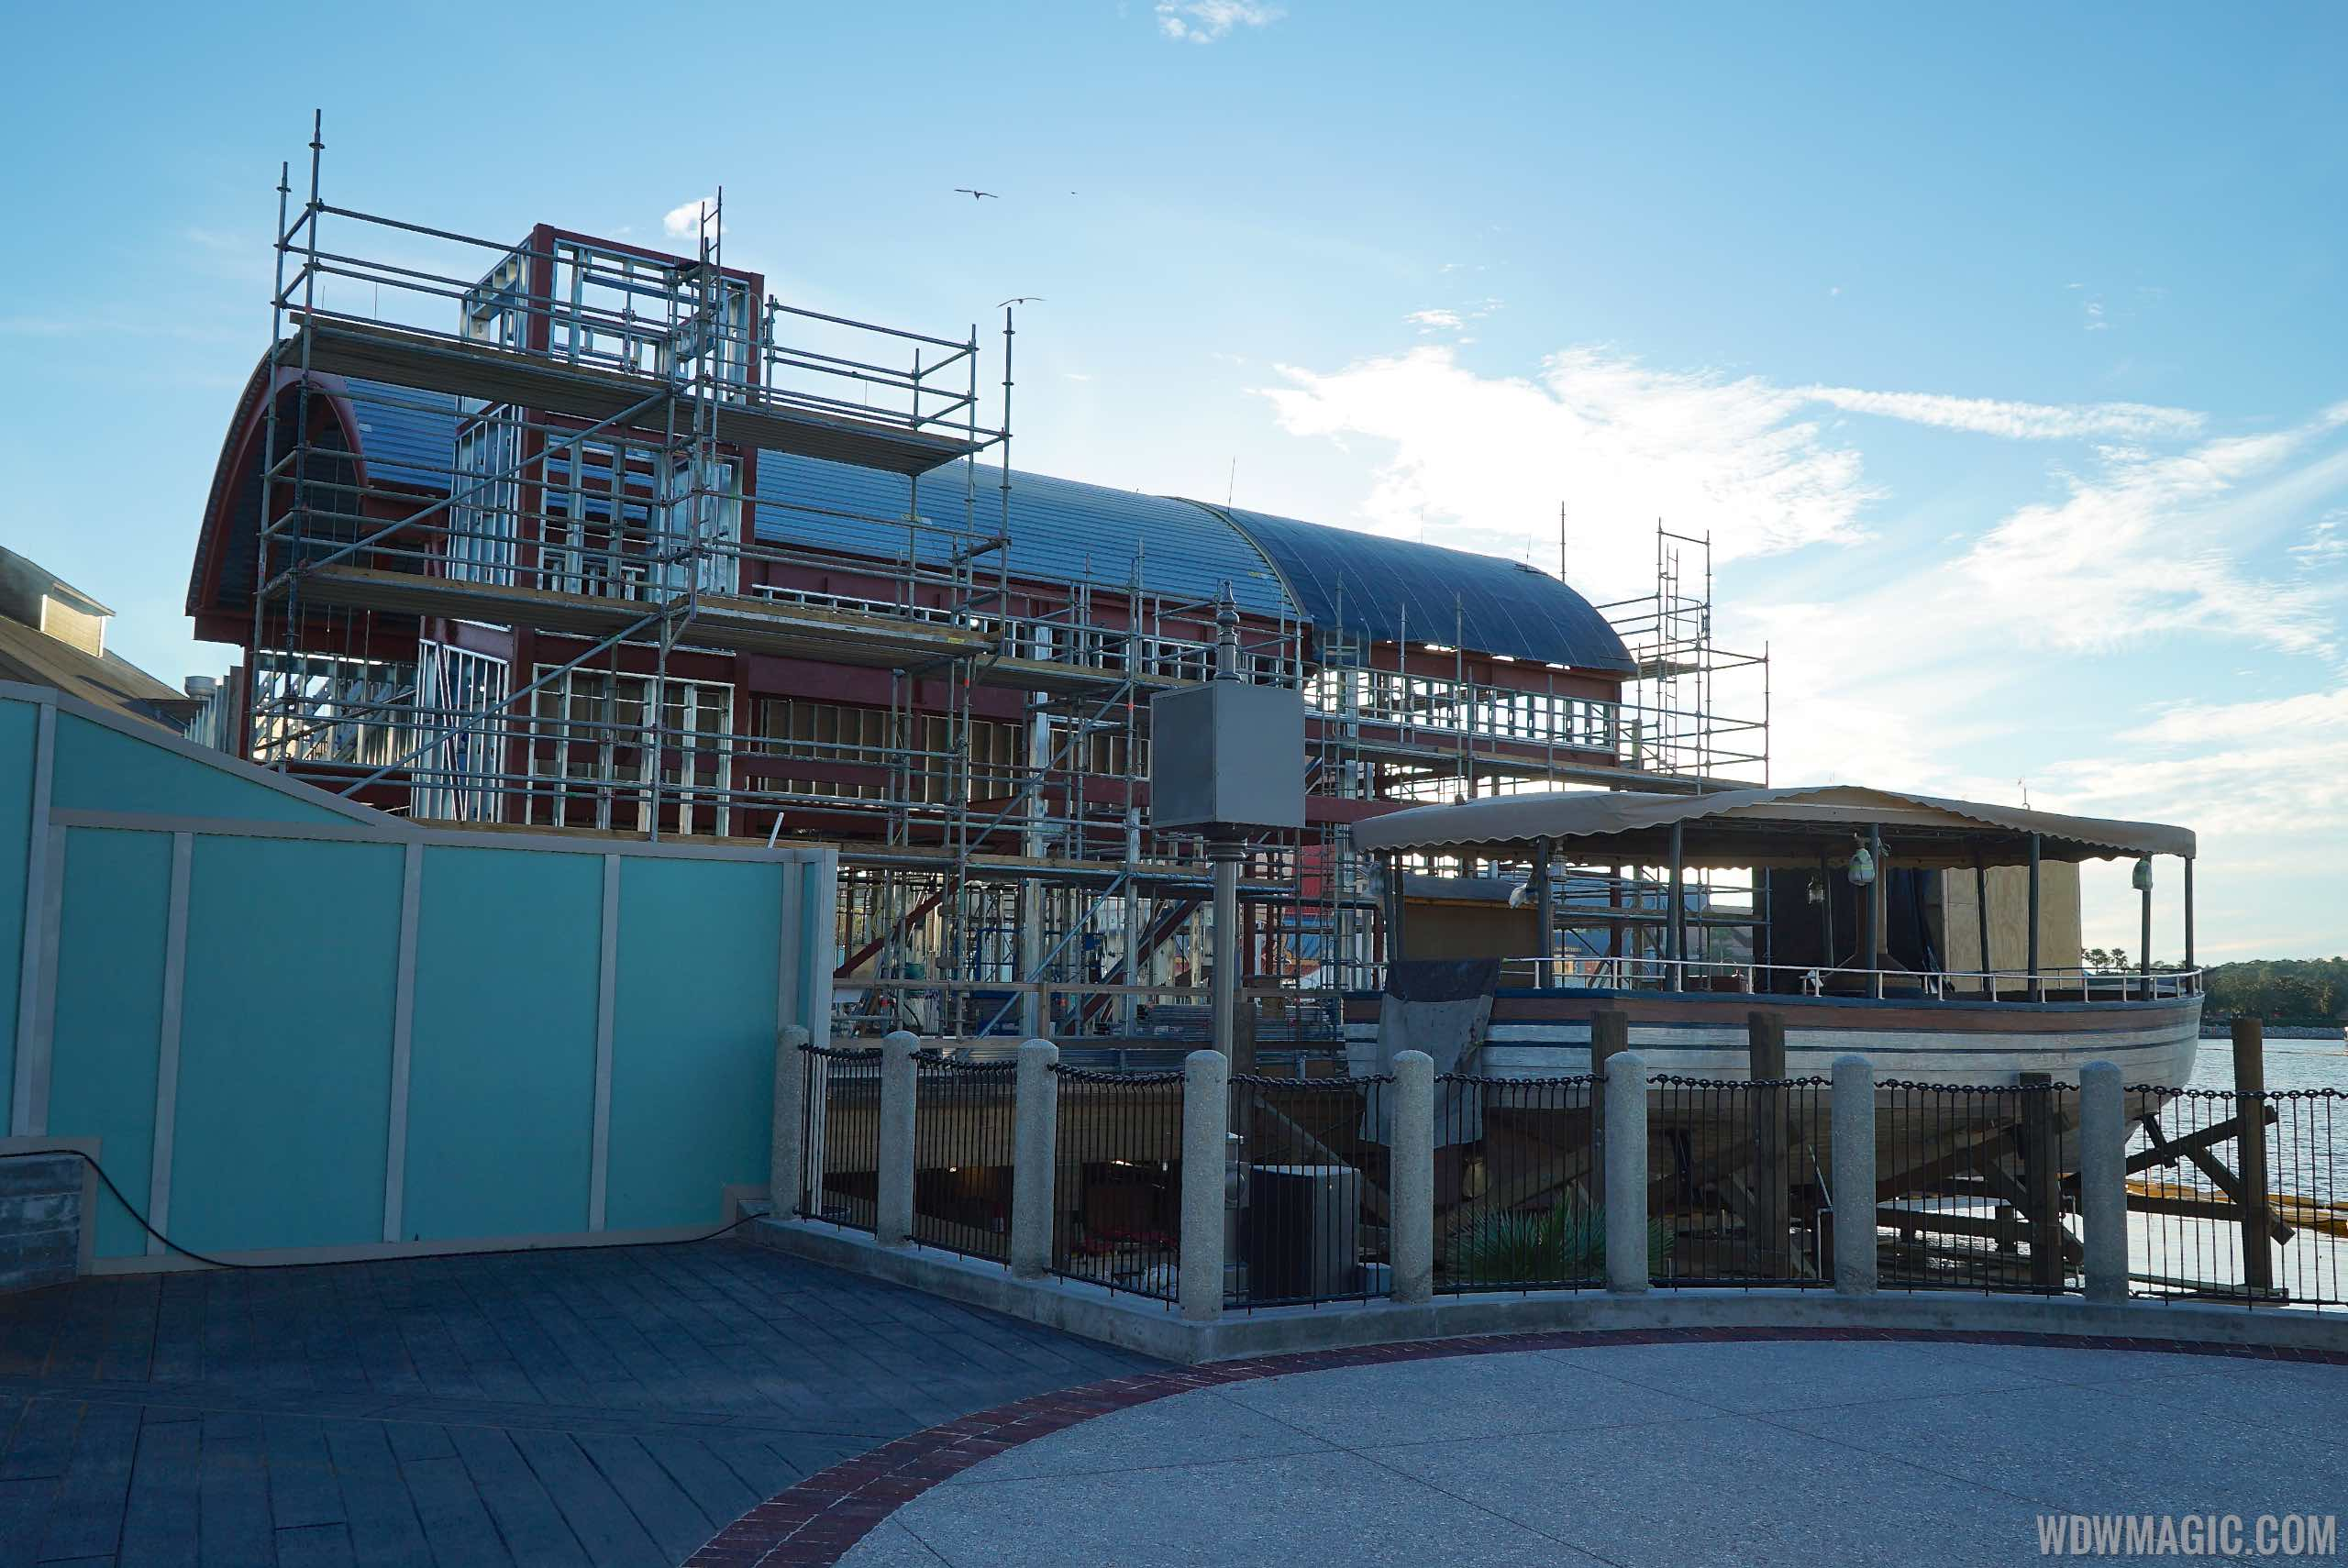 The Hangar construction